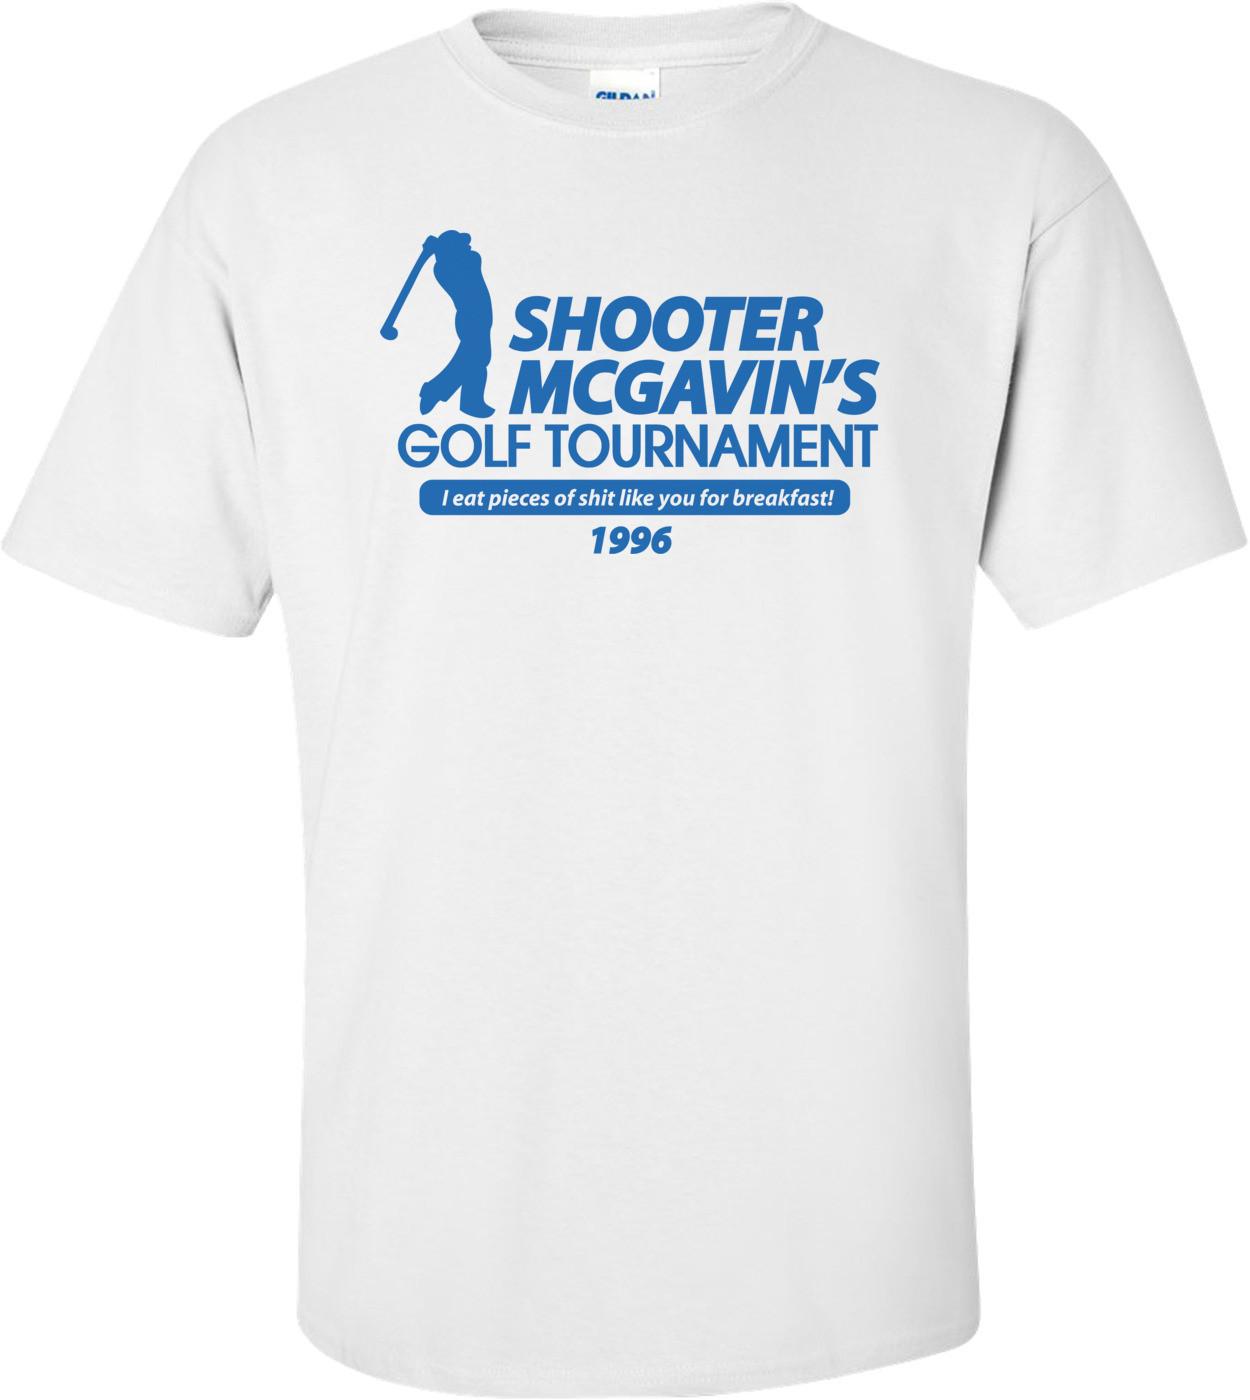 Shooter Mcgavin's Golf Tournament